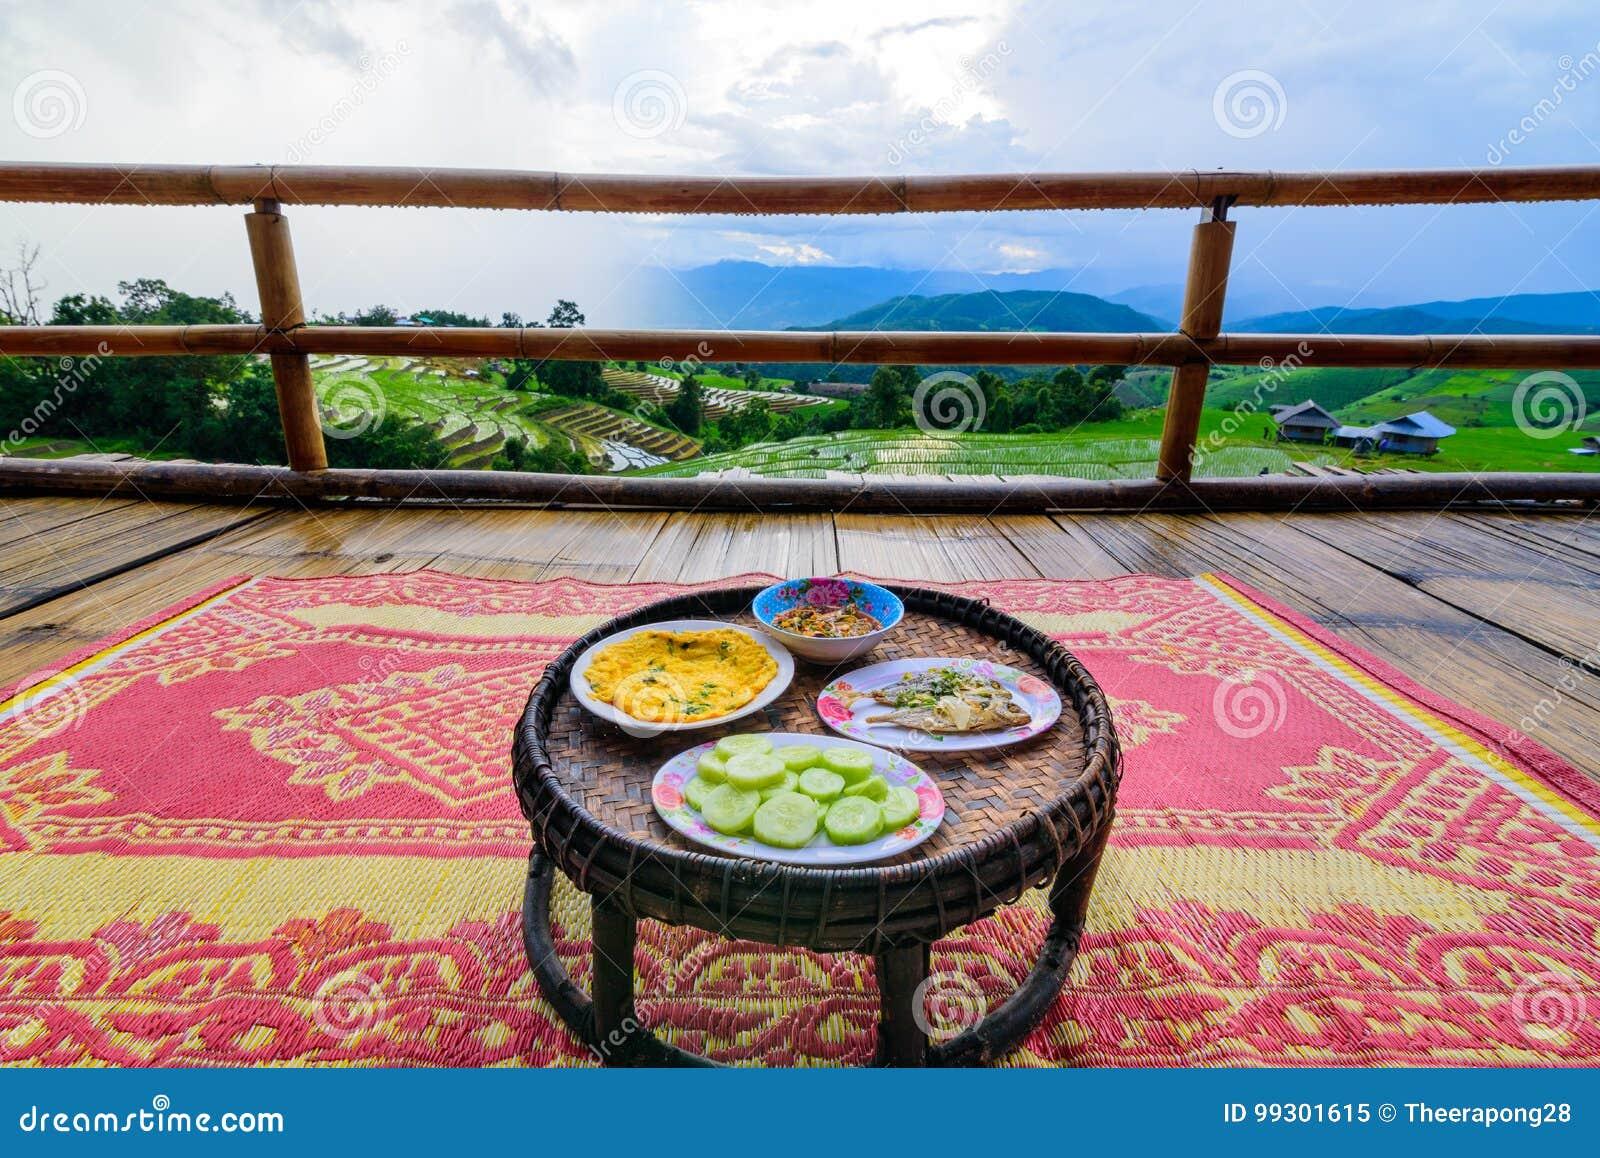 Khantok (food tray) Thai food traditionally dinner for homestay